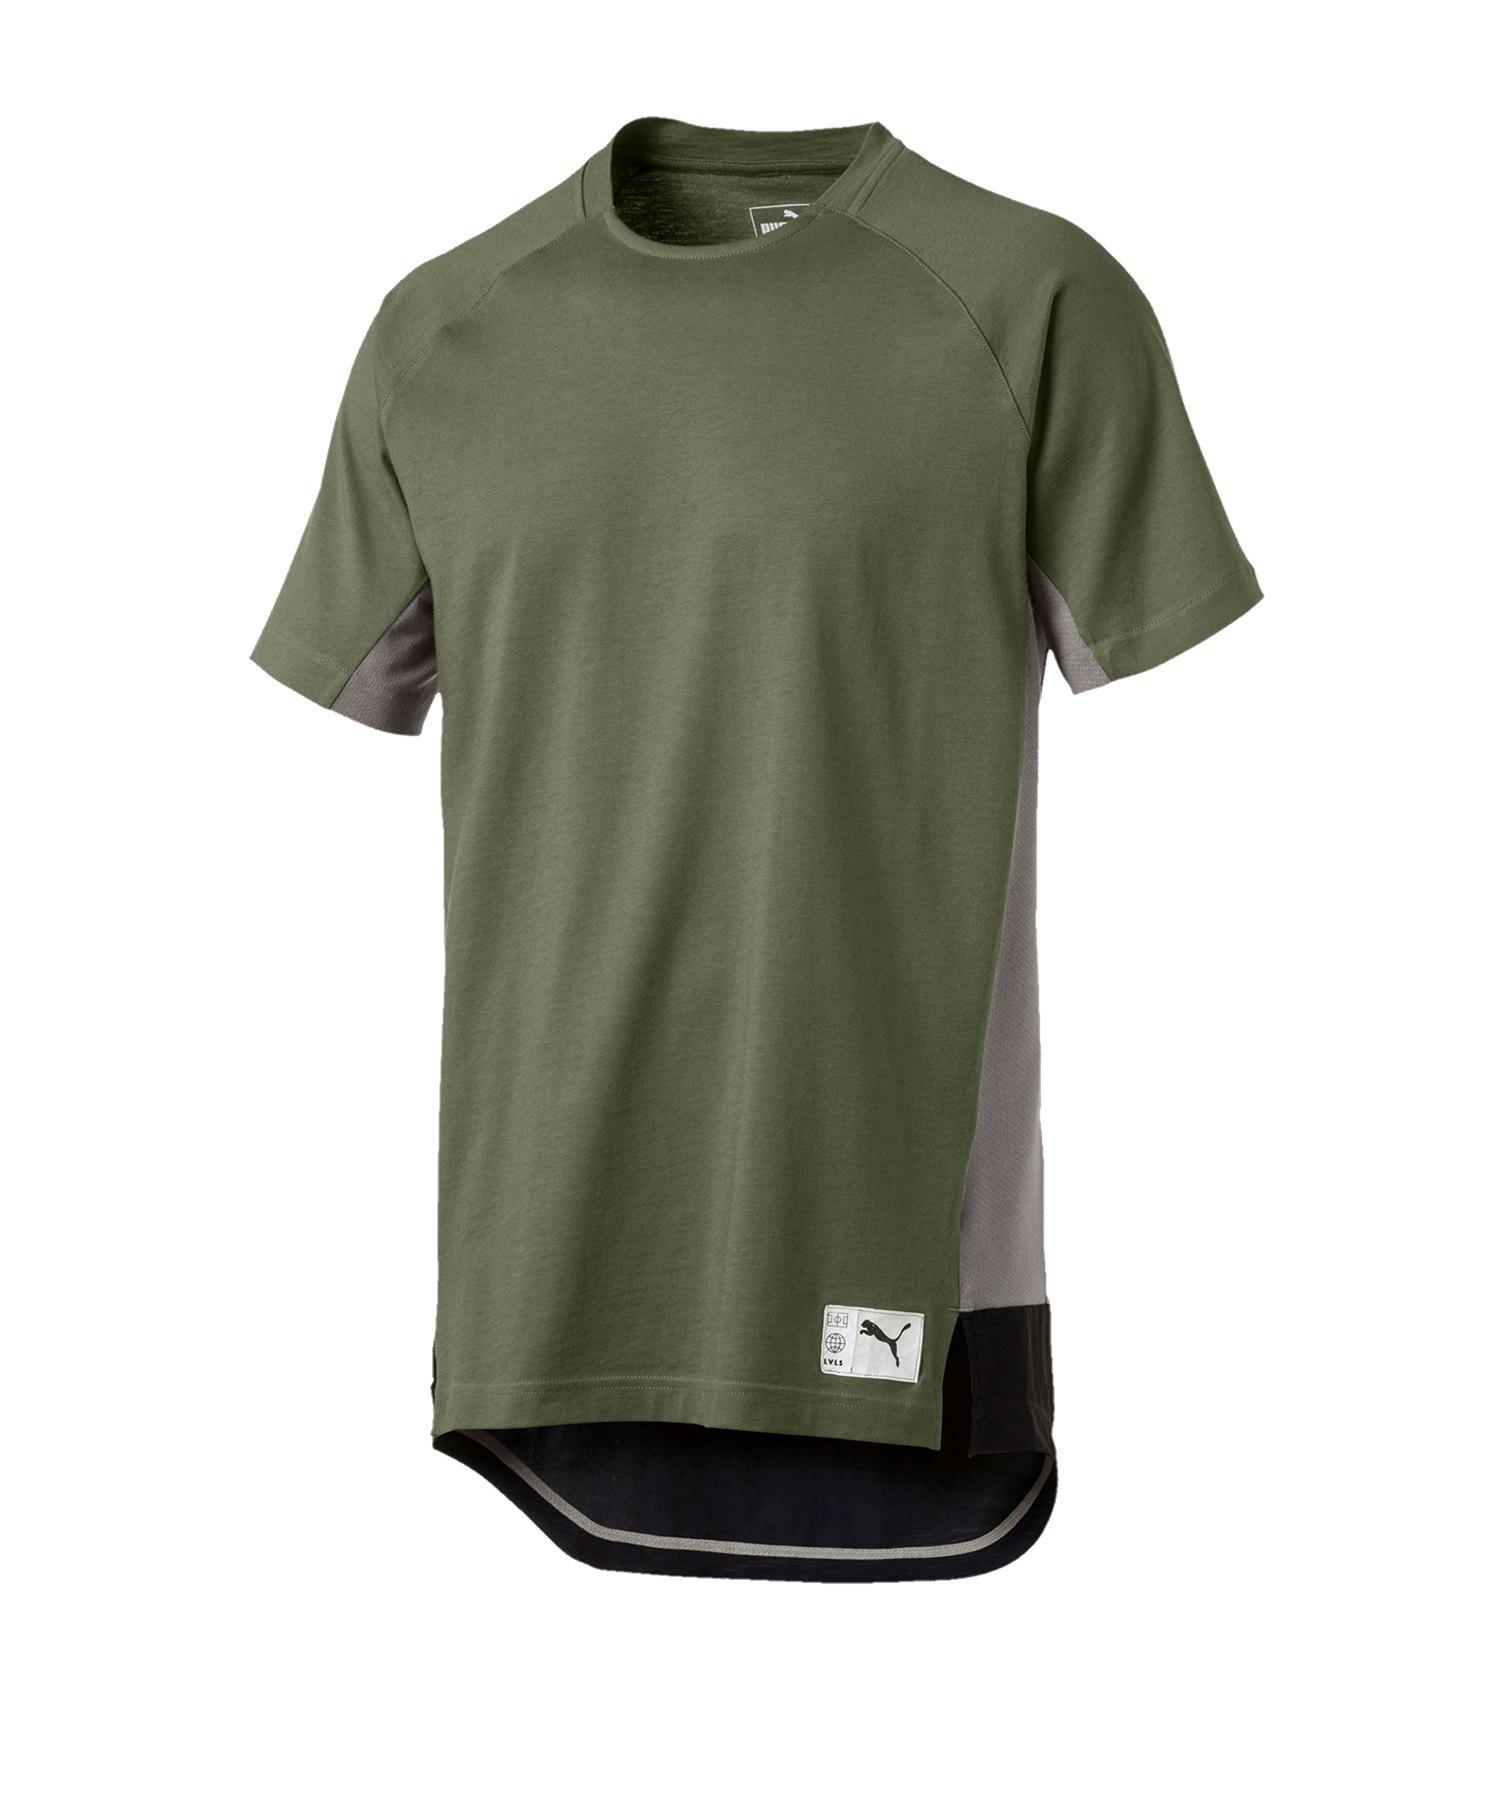 PUMA ftblNXT Casuals Graphic T-Shirt Khaki F03 - khaki